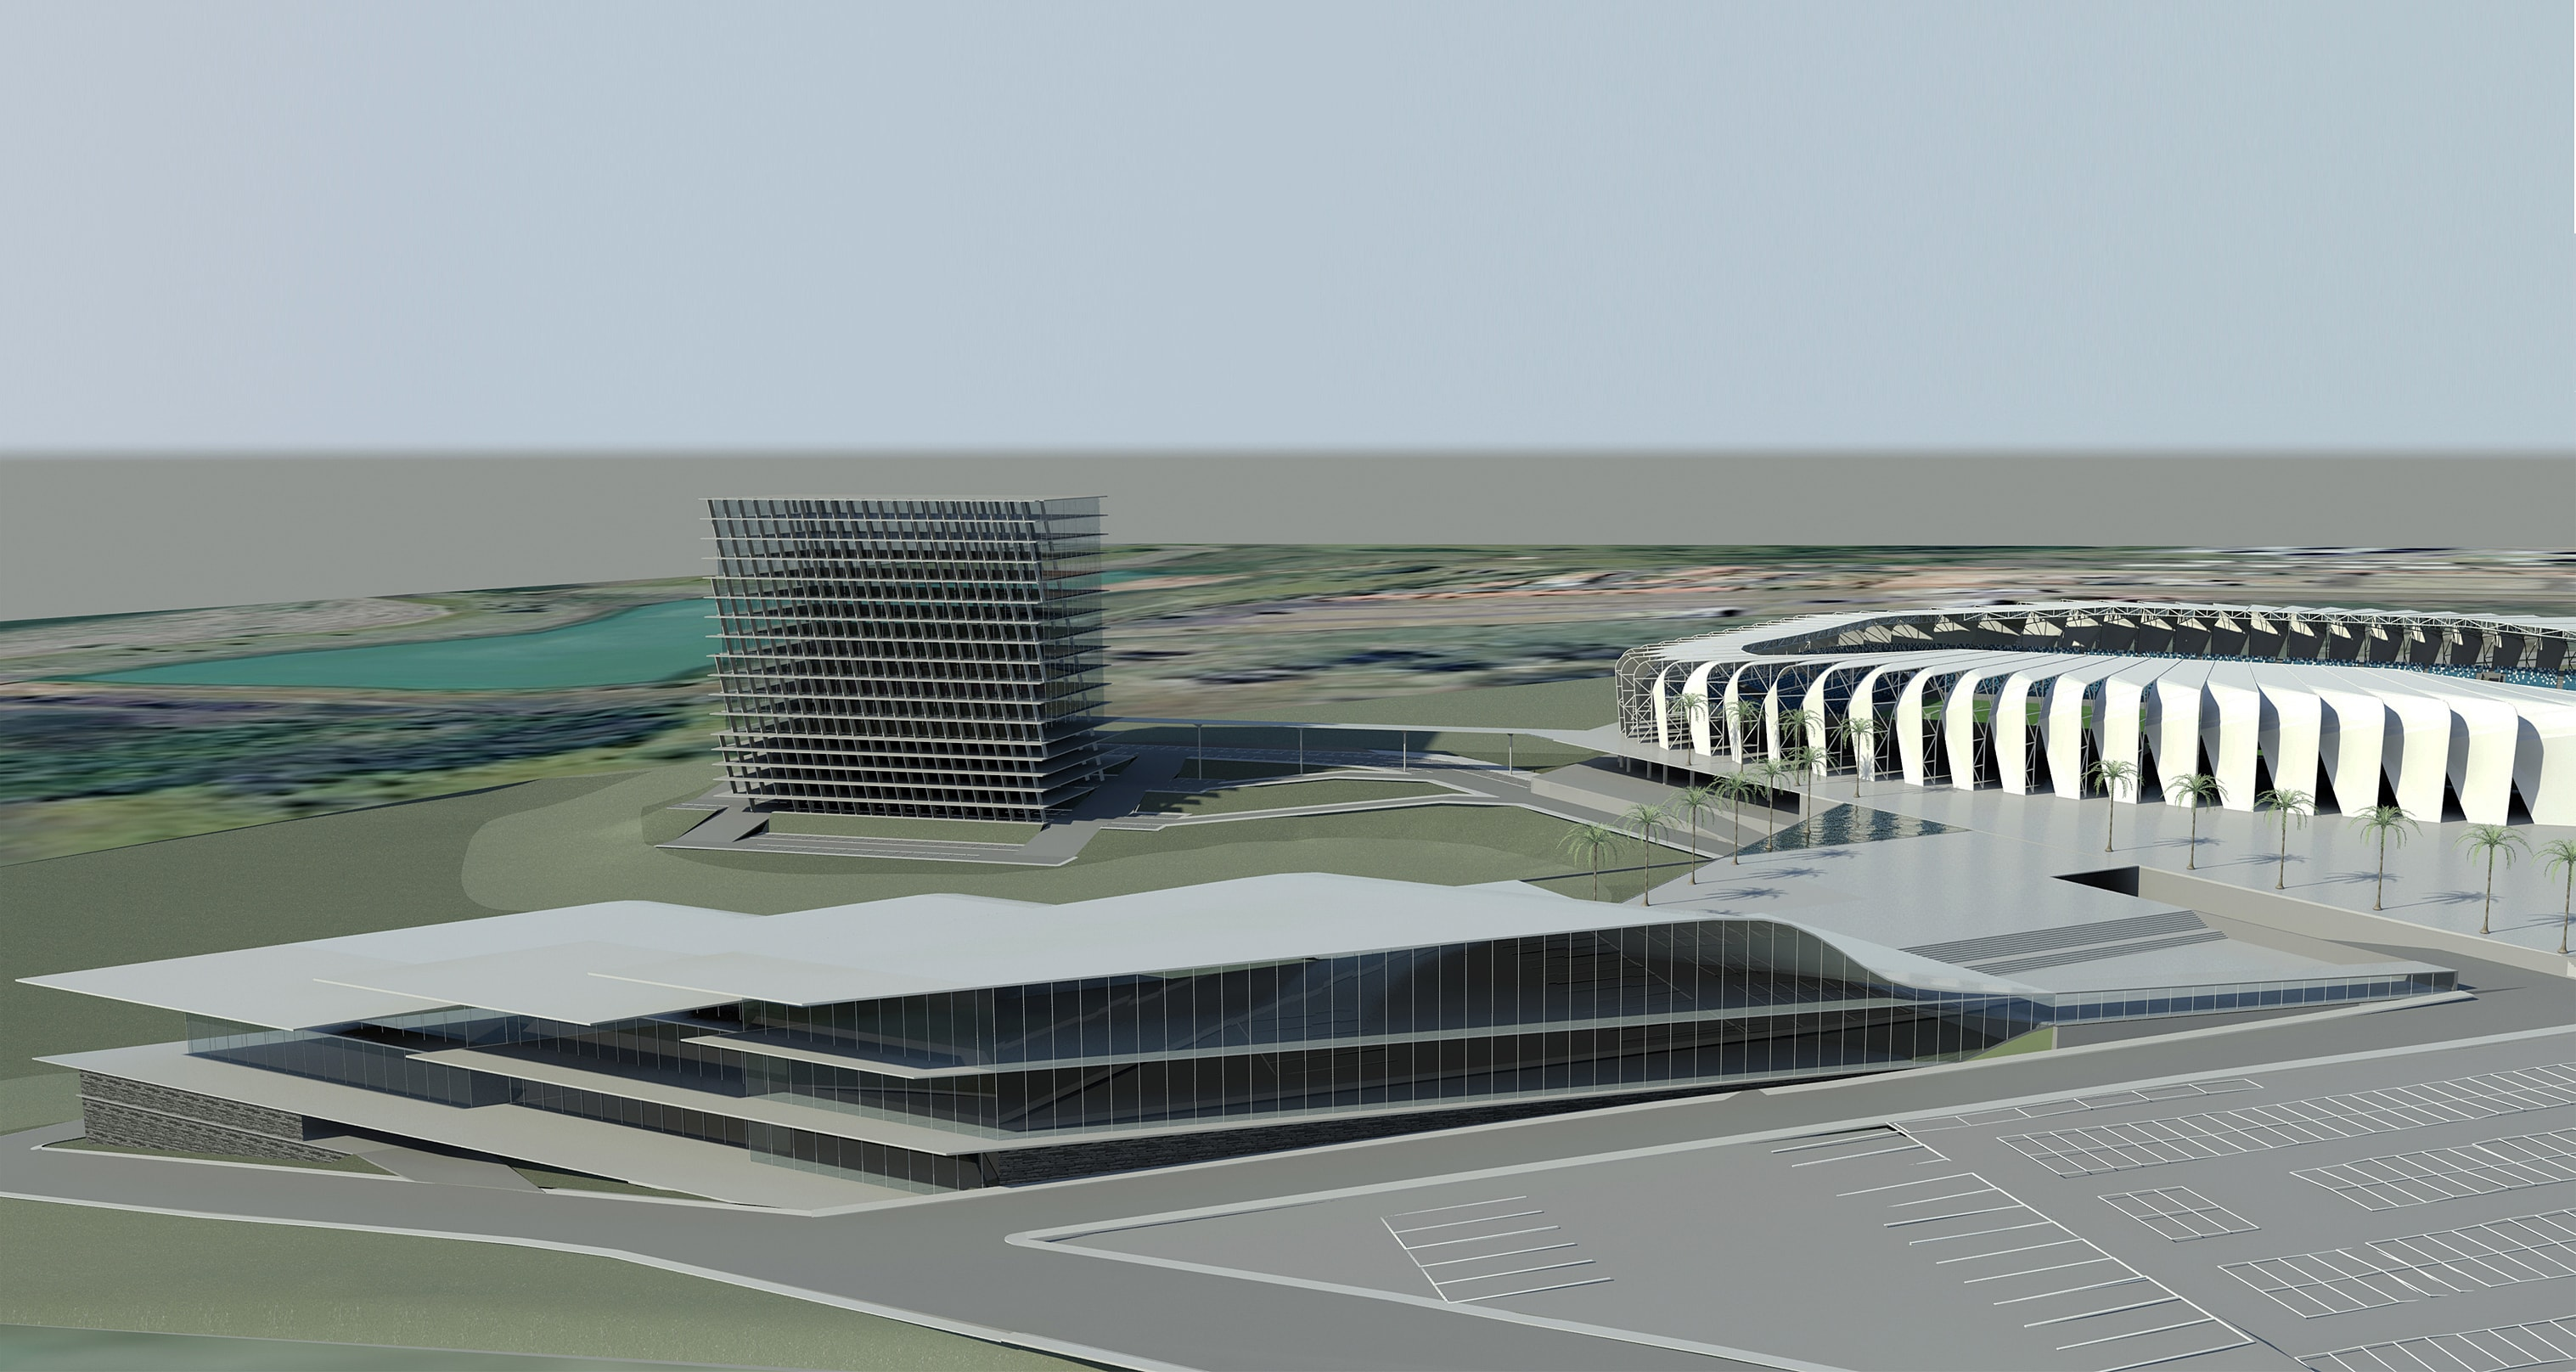 Complexo Convenções Arena Guarani